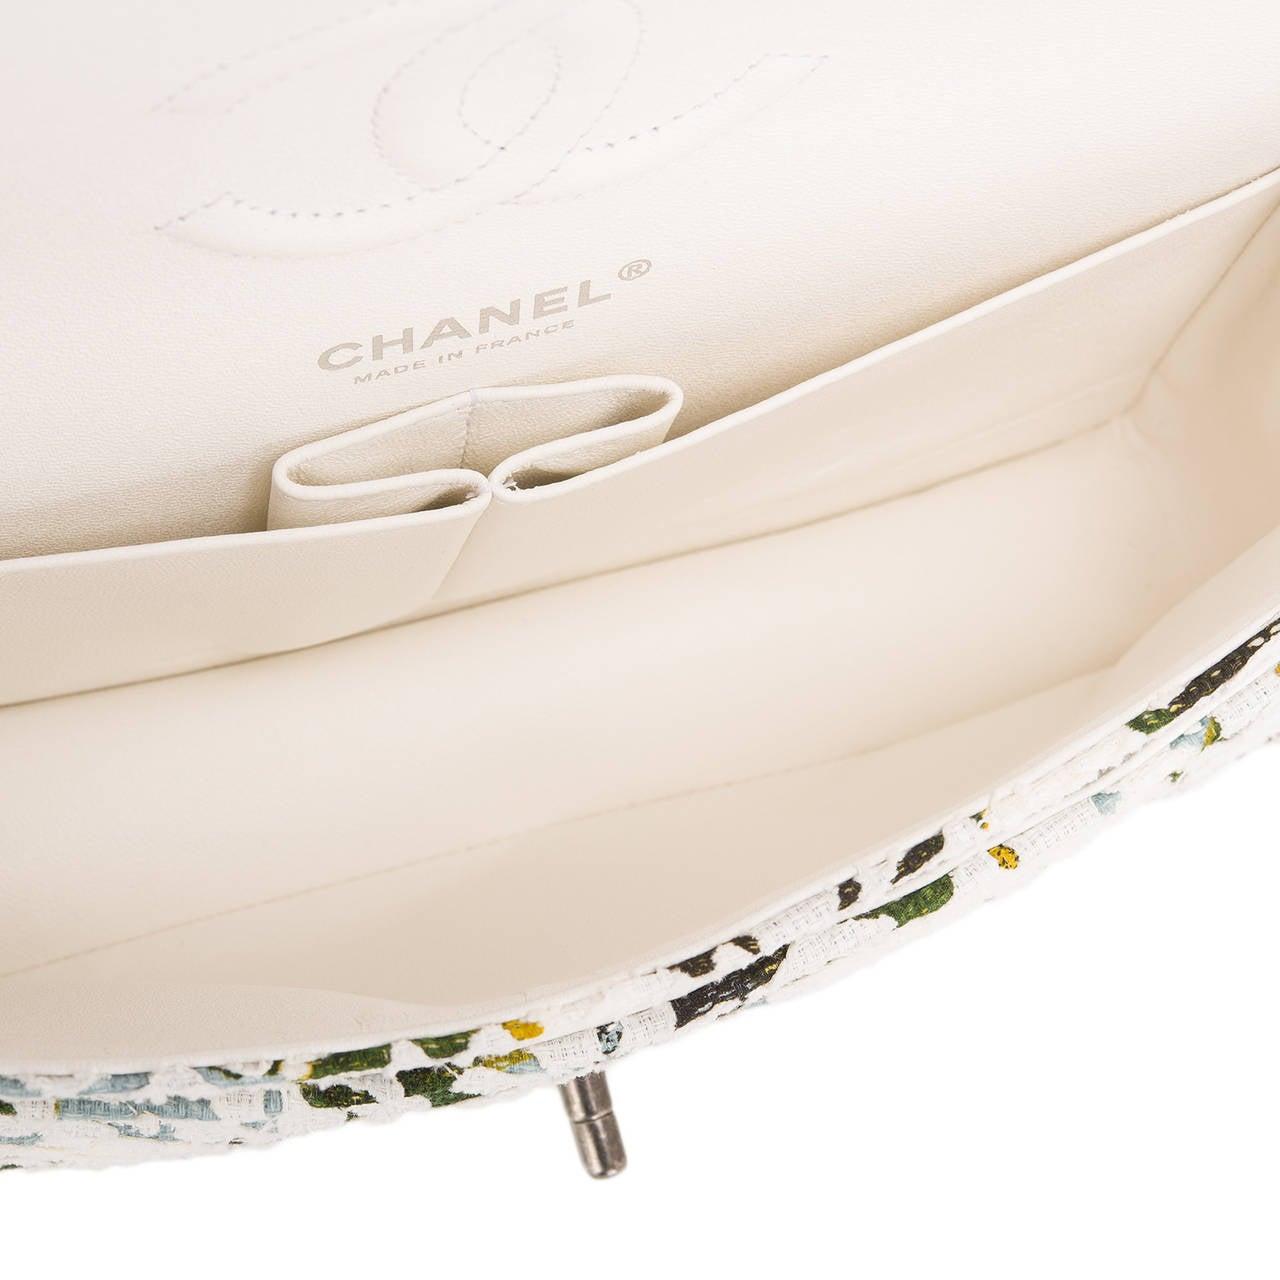 Chanel Floral Medium Classic Double Flap Bag For Sale 1